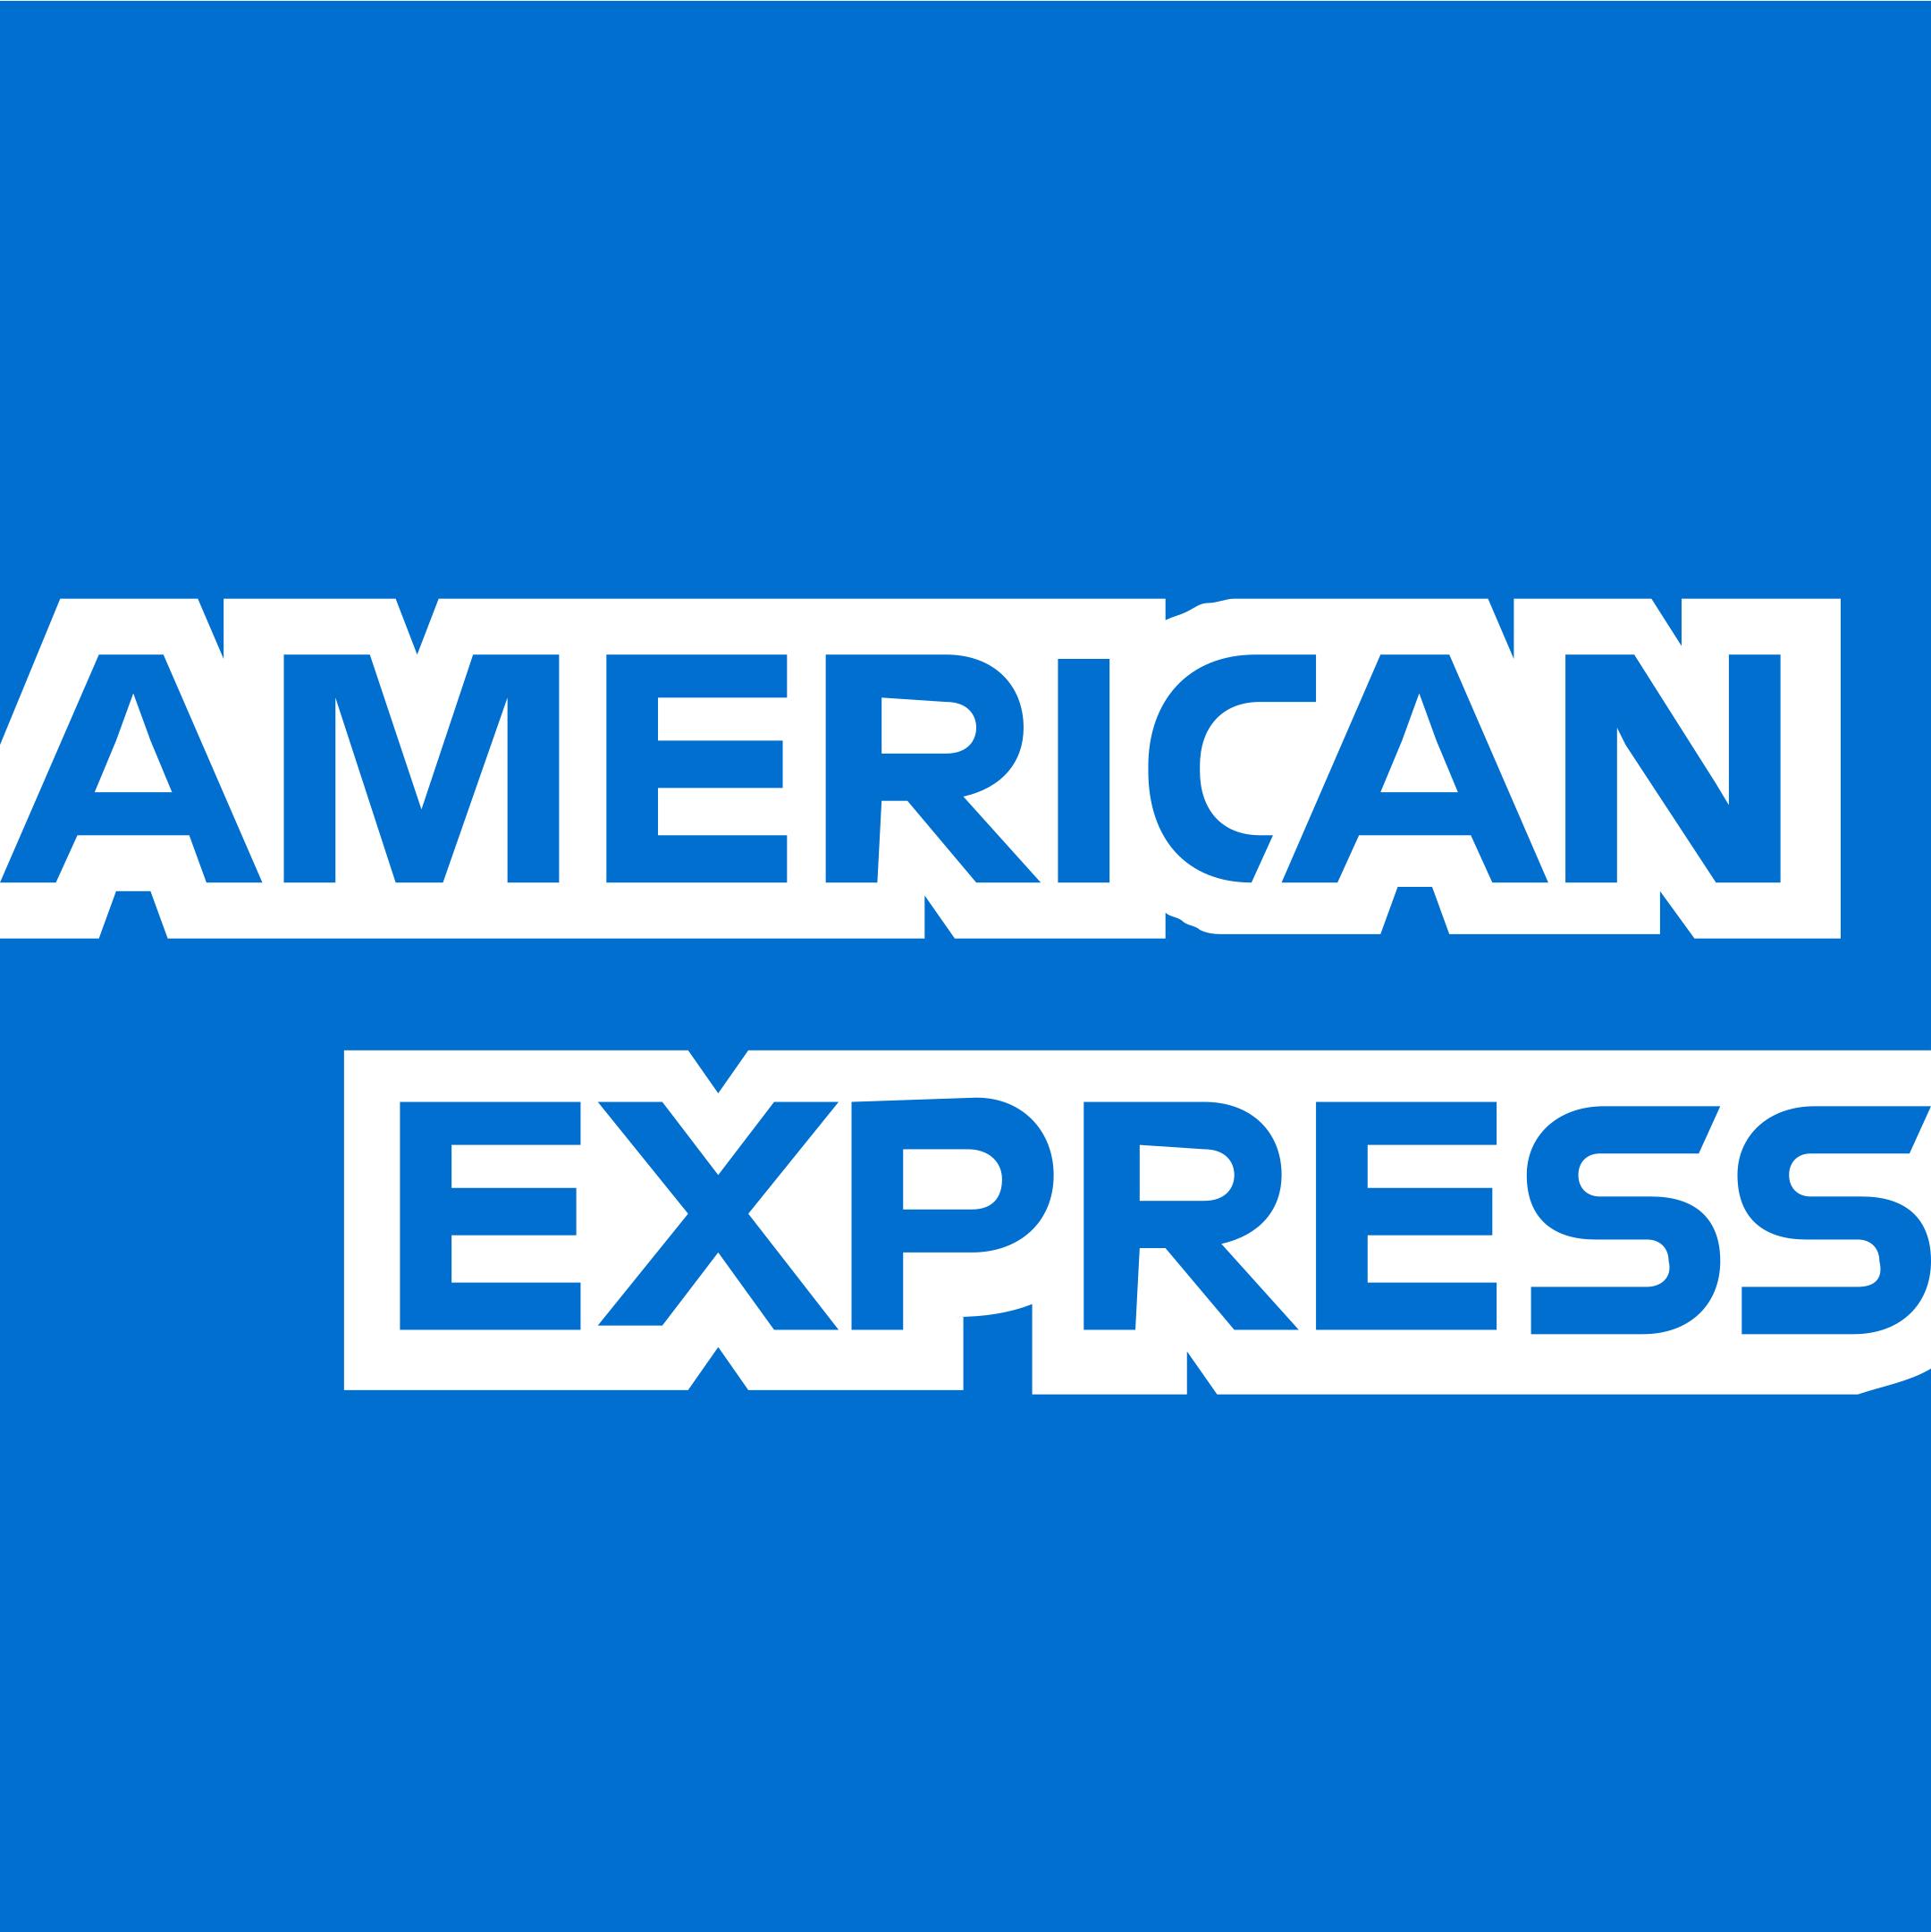 amex american express logo 1 - American Express Logo